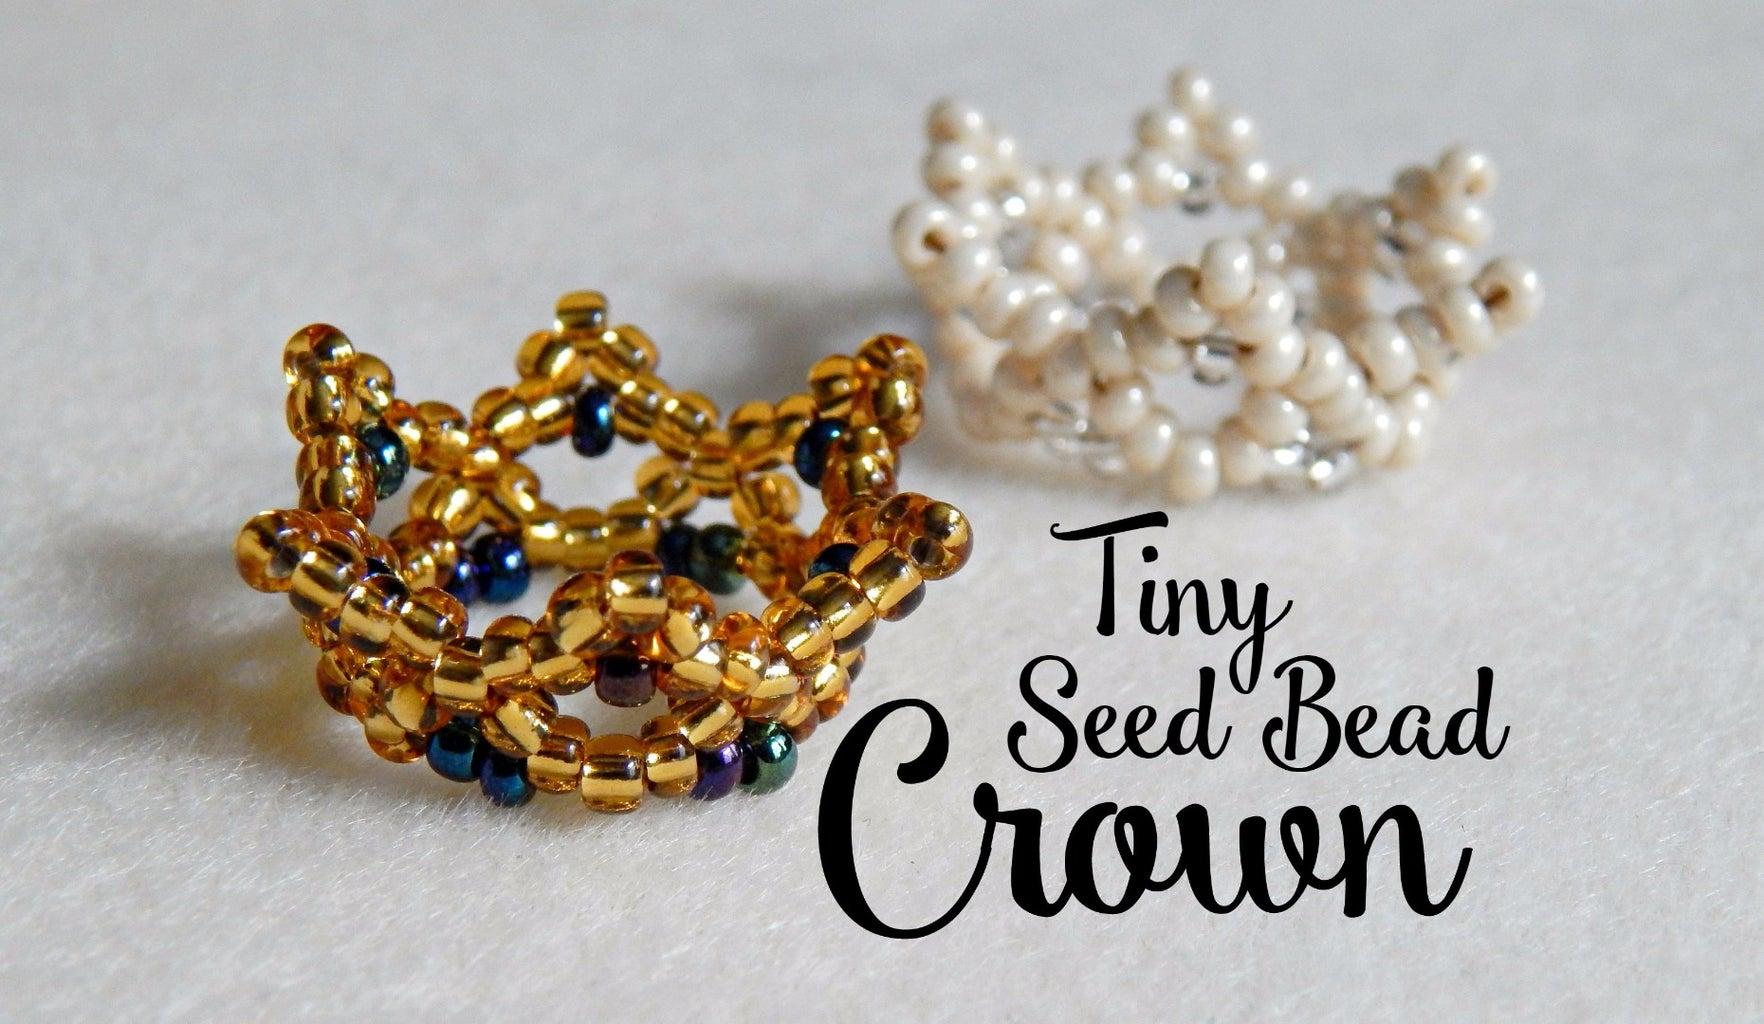 Tiny Beaded Crown ¦ the Corner of Craft